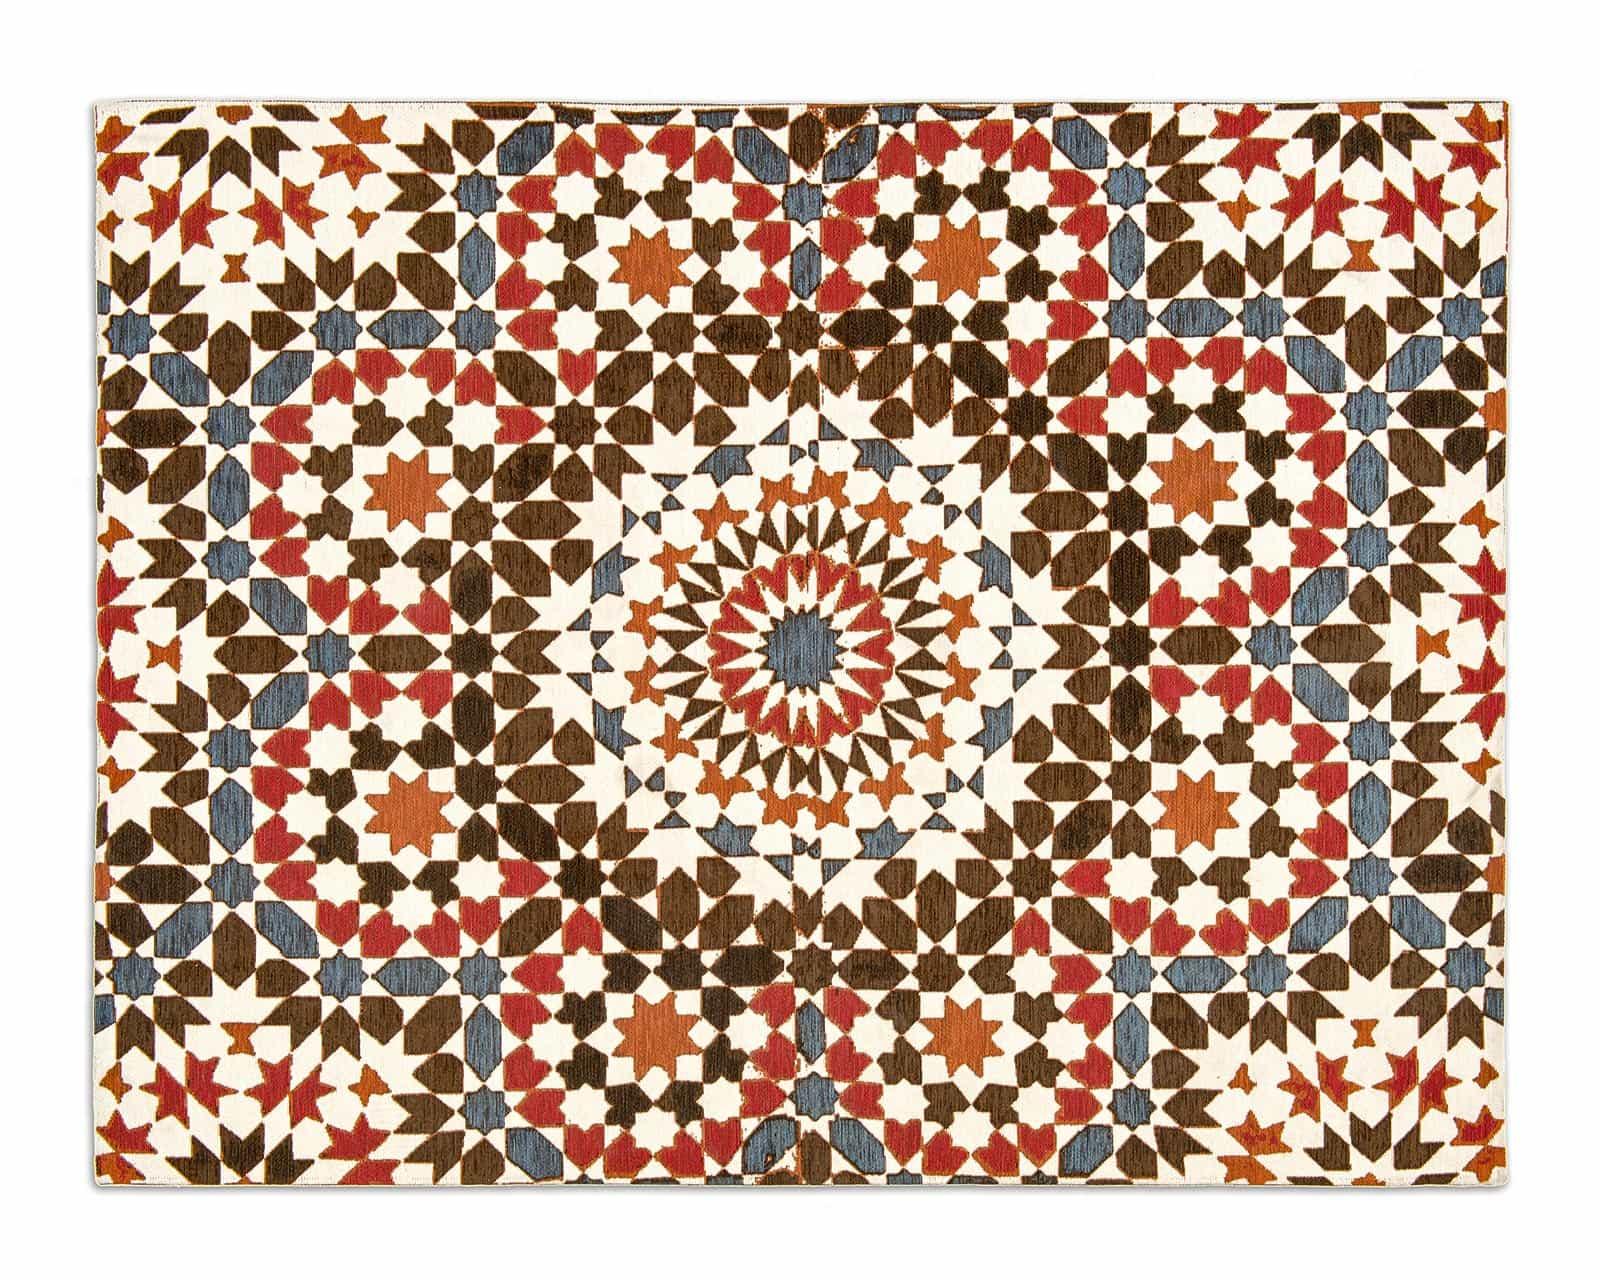 tappeto marocco calligaris pozzoli living moving. Black Bedroom Furniture Sets. Home Design Ideas